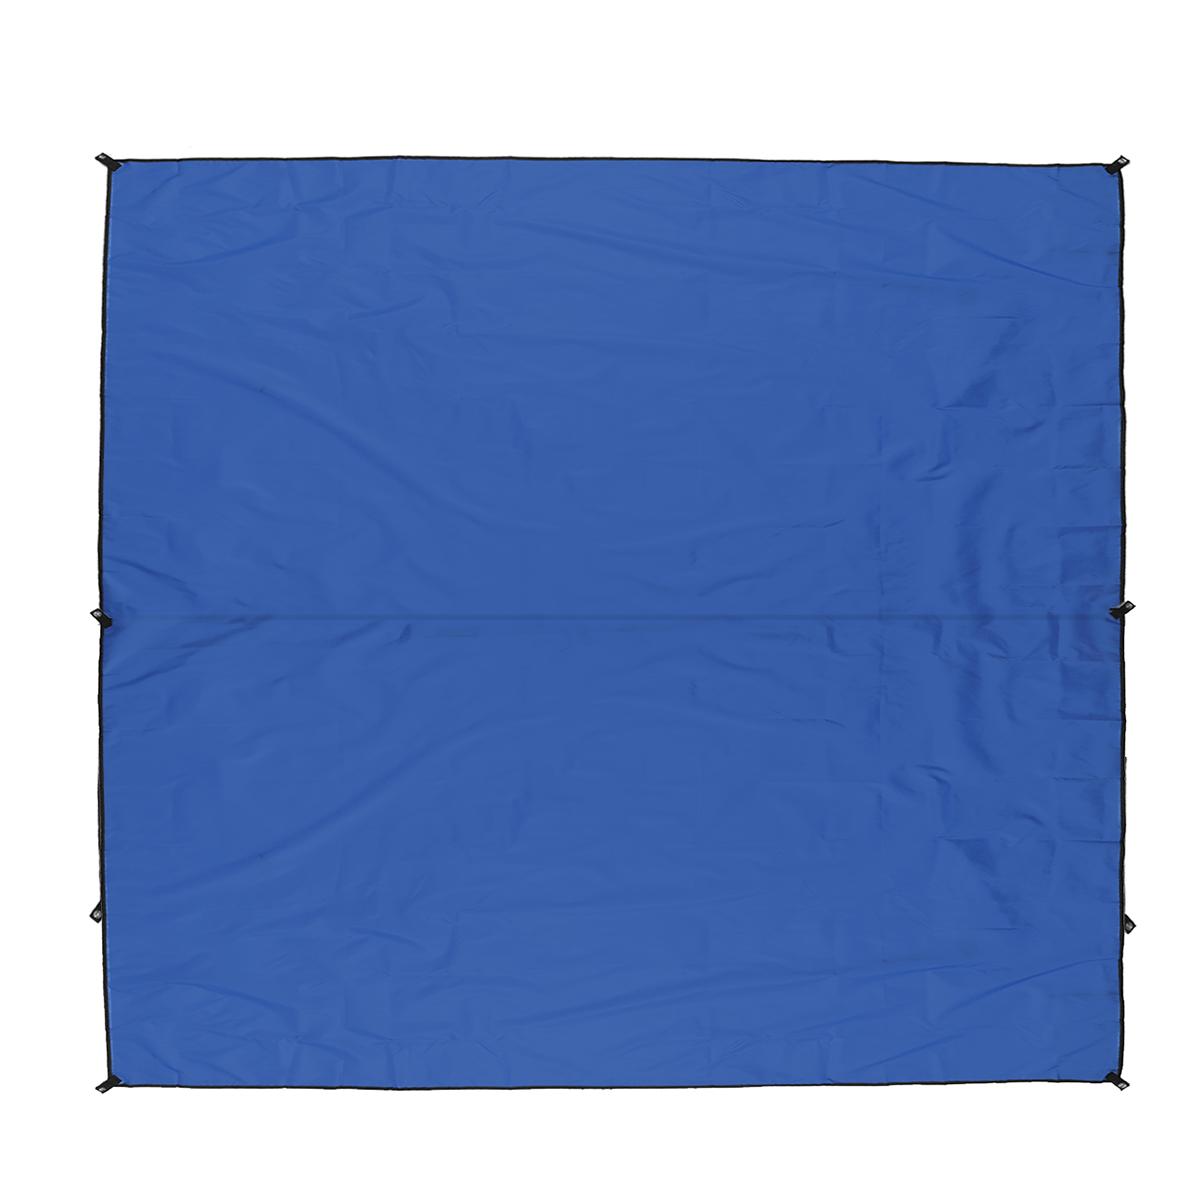 300x300cm Outdoor Camping Tent Sunshade Rain Sun UV Beach Canopy Awning Shelter Beach Picnic Mat Ground Pad